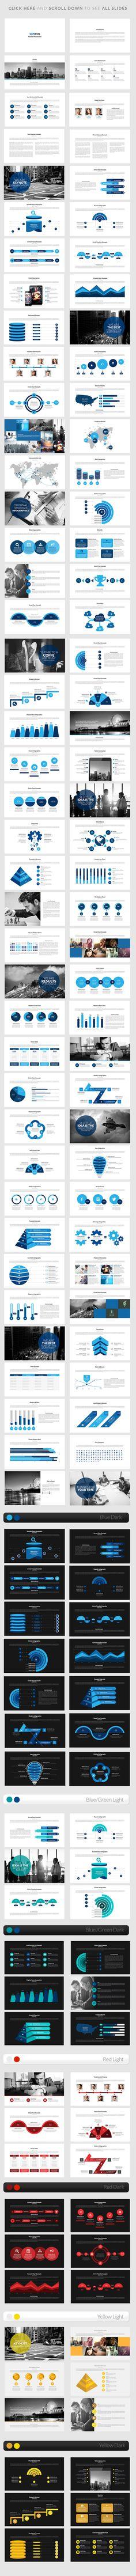 Genesis | Powerpoint Presentation by Zacomic Studios on Creative Market